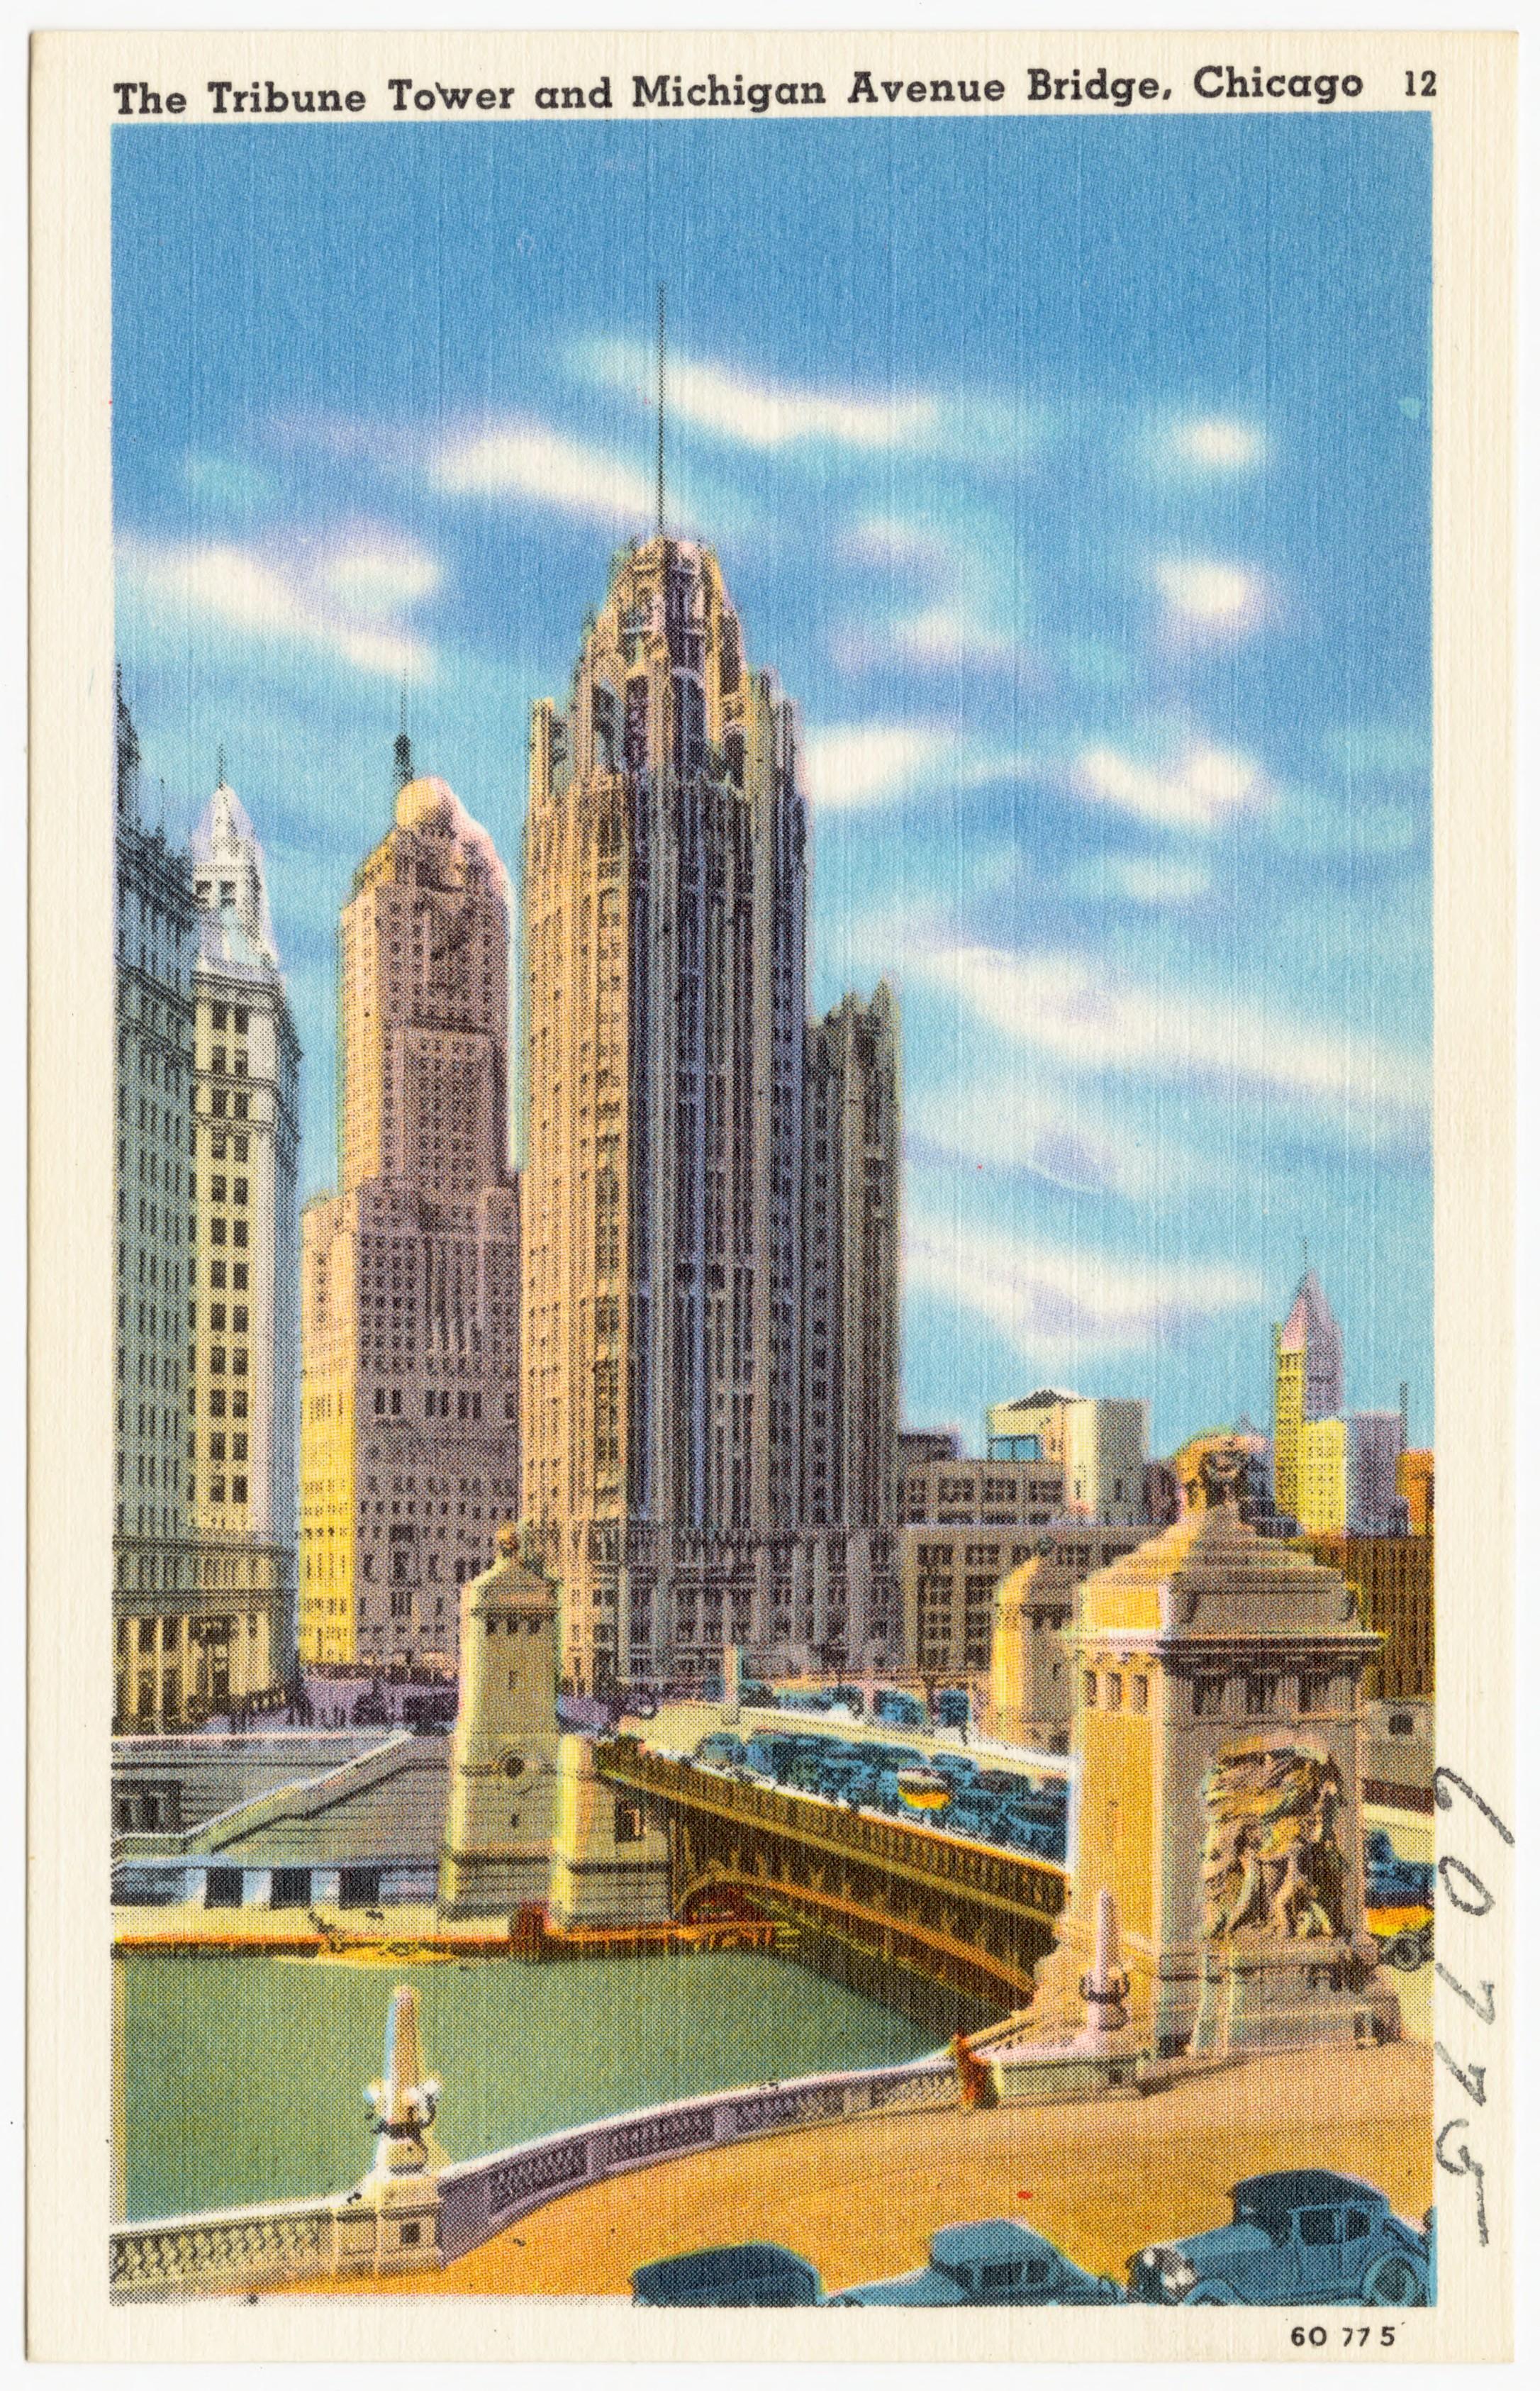 The_Tribune_Tower_and_Michigan_Avenue_Bridge,_Chicago_(60775).jpg